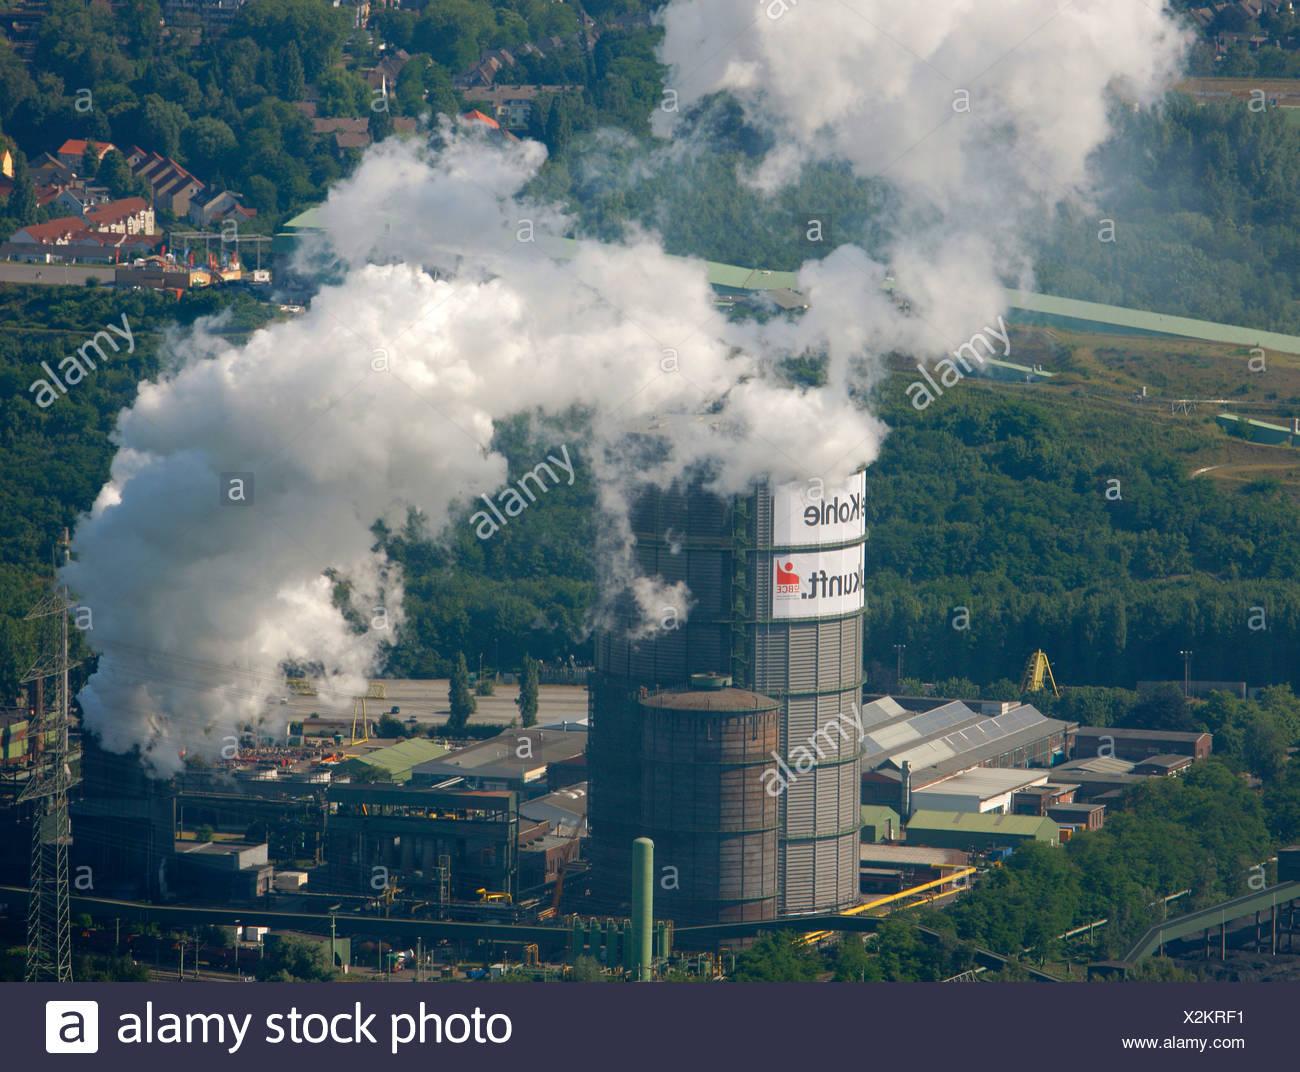 Aerial photo, Prosper Coke Plant, Bottrop, Essen, Ruhr Area, North Rhine-Westphalia, Germany, Europe - Stock Image